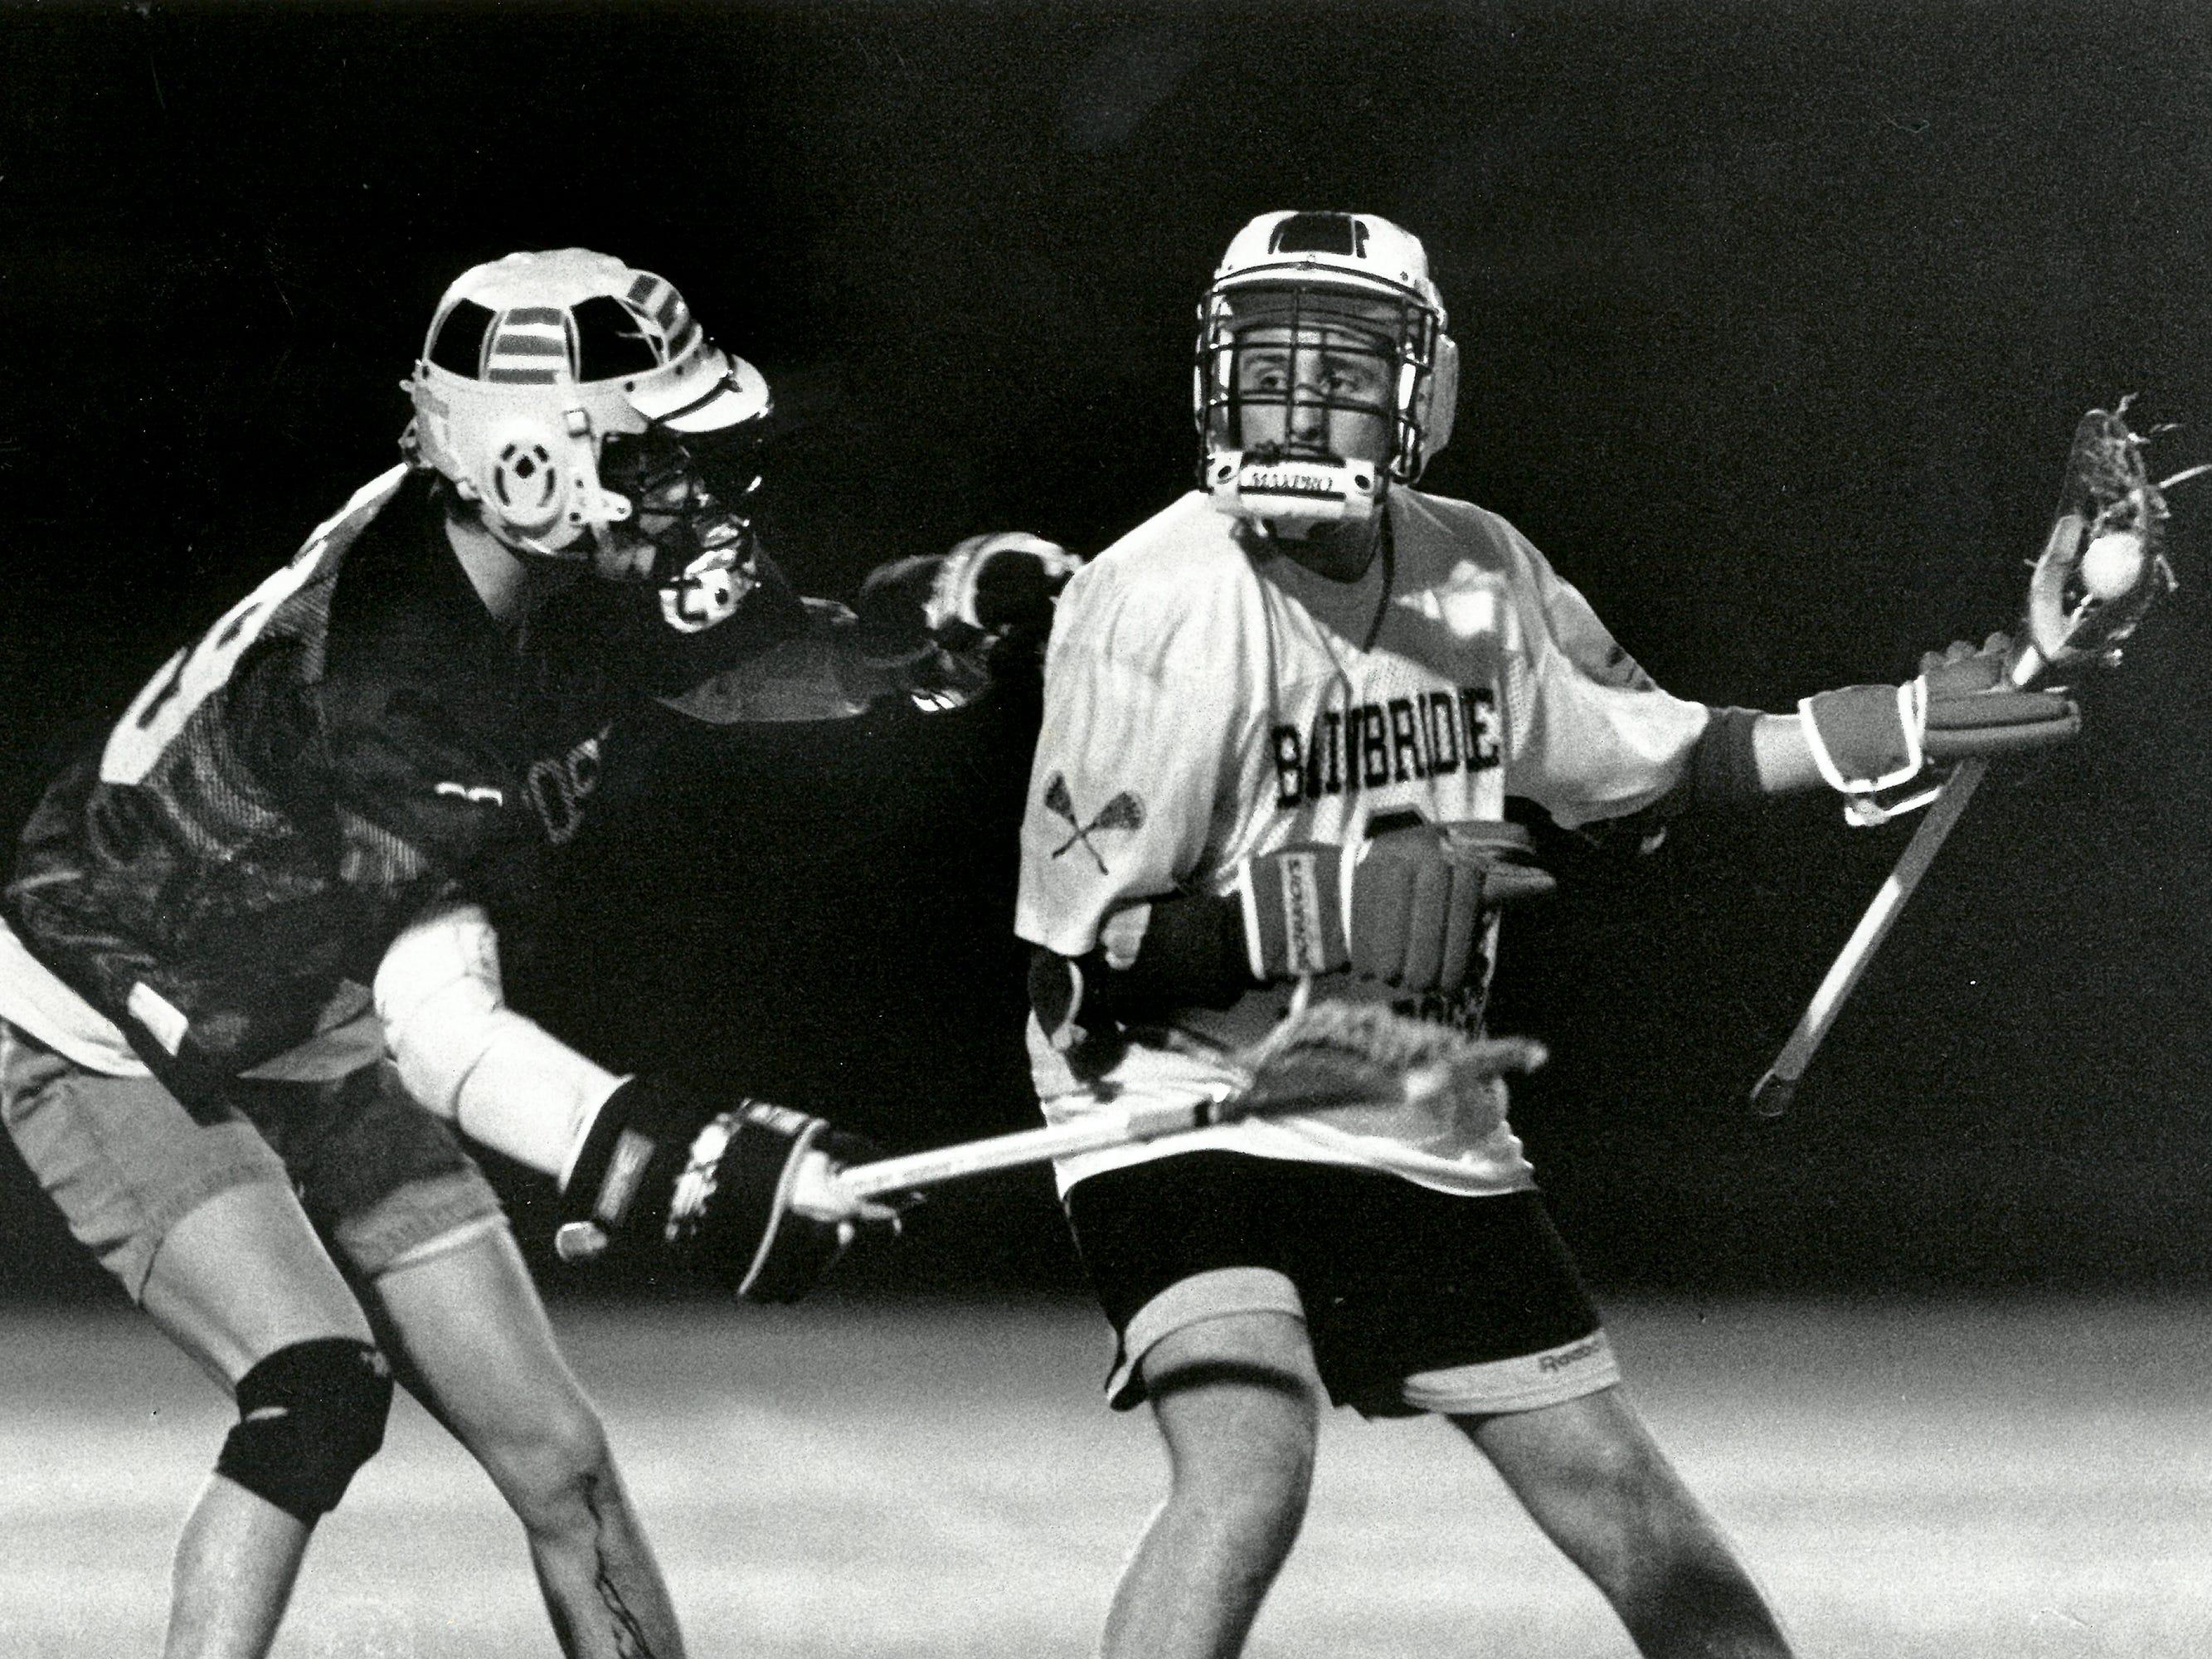 03/31/92Bainbridge Justin VanEss and NK Lacrosse